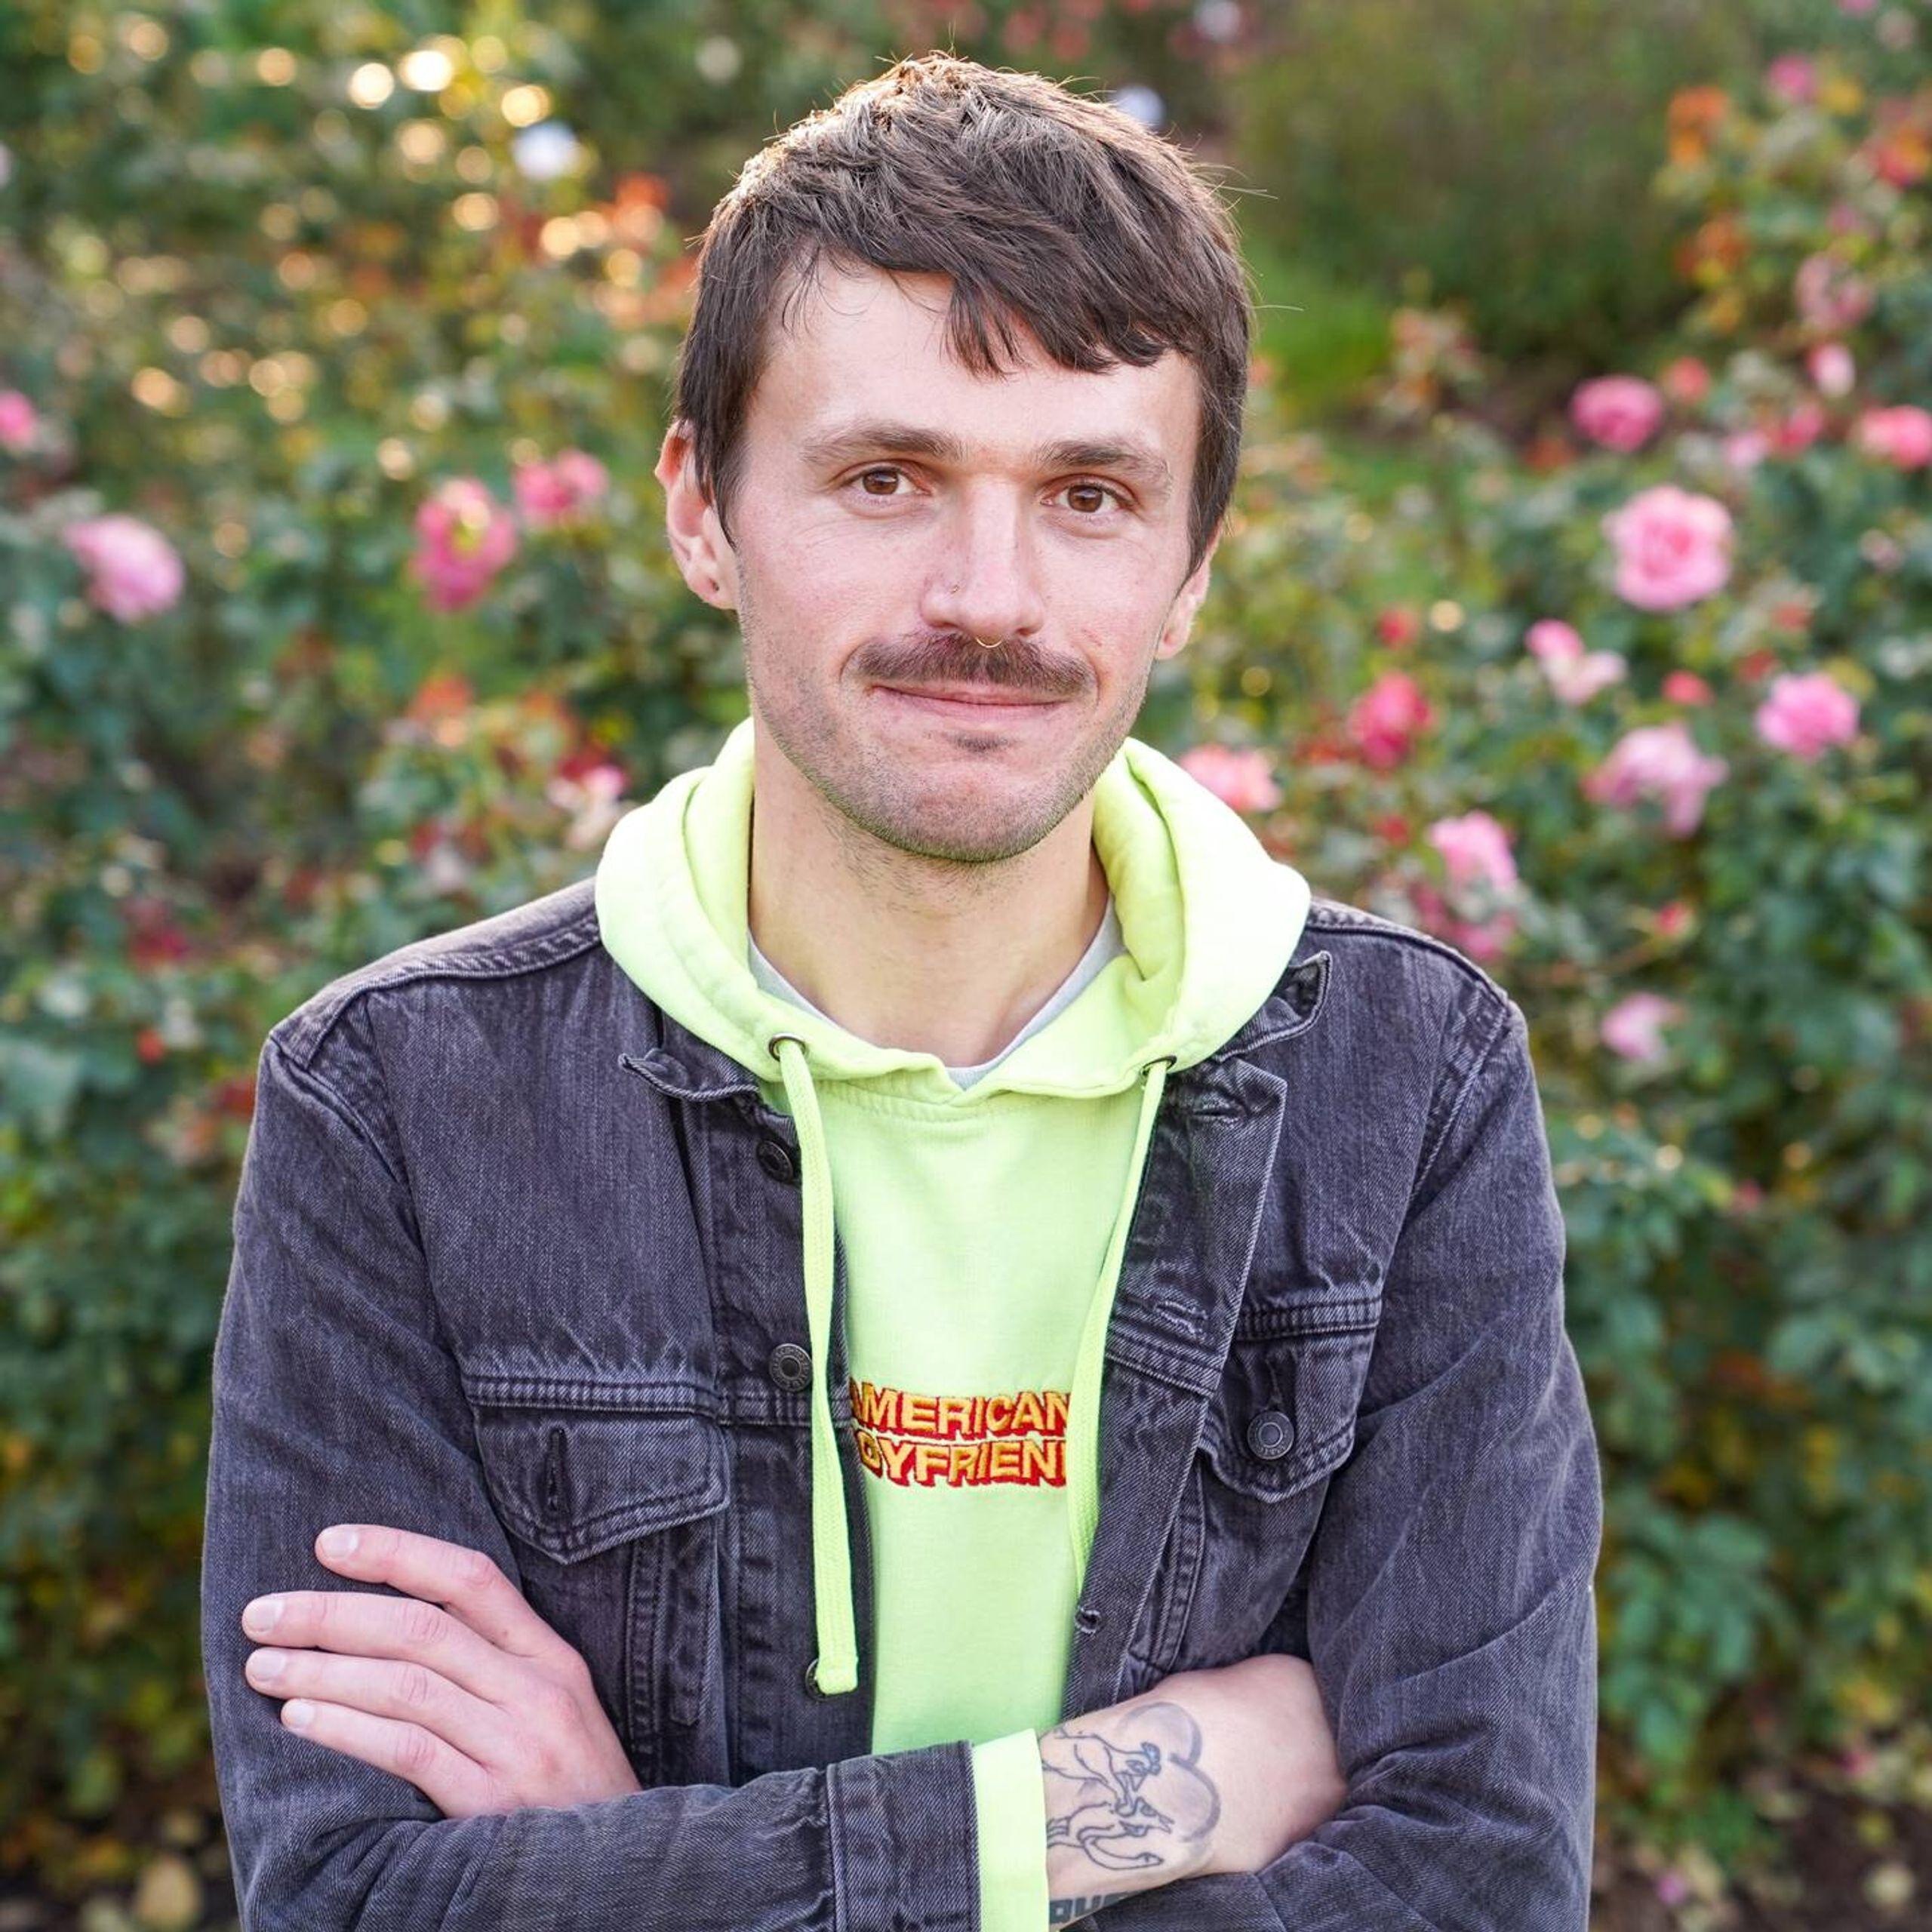 Portrait of a mustachioed man standing in a rose garden, online lives, rewire